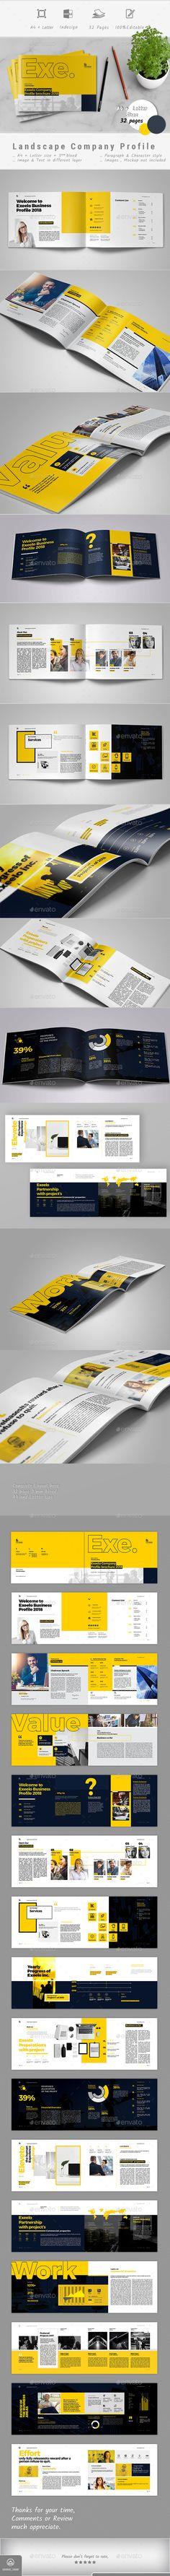 Landscape Company Profile Brochure Template InDesign INDD